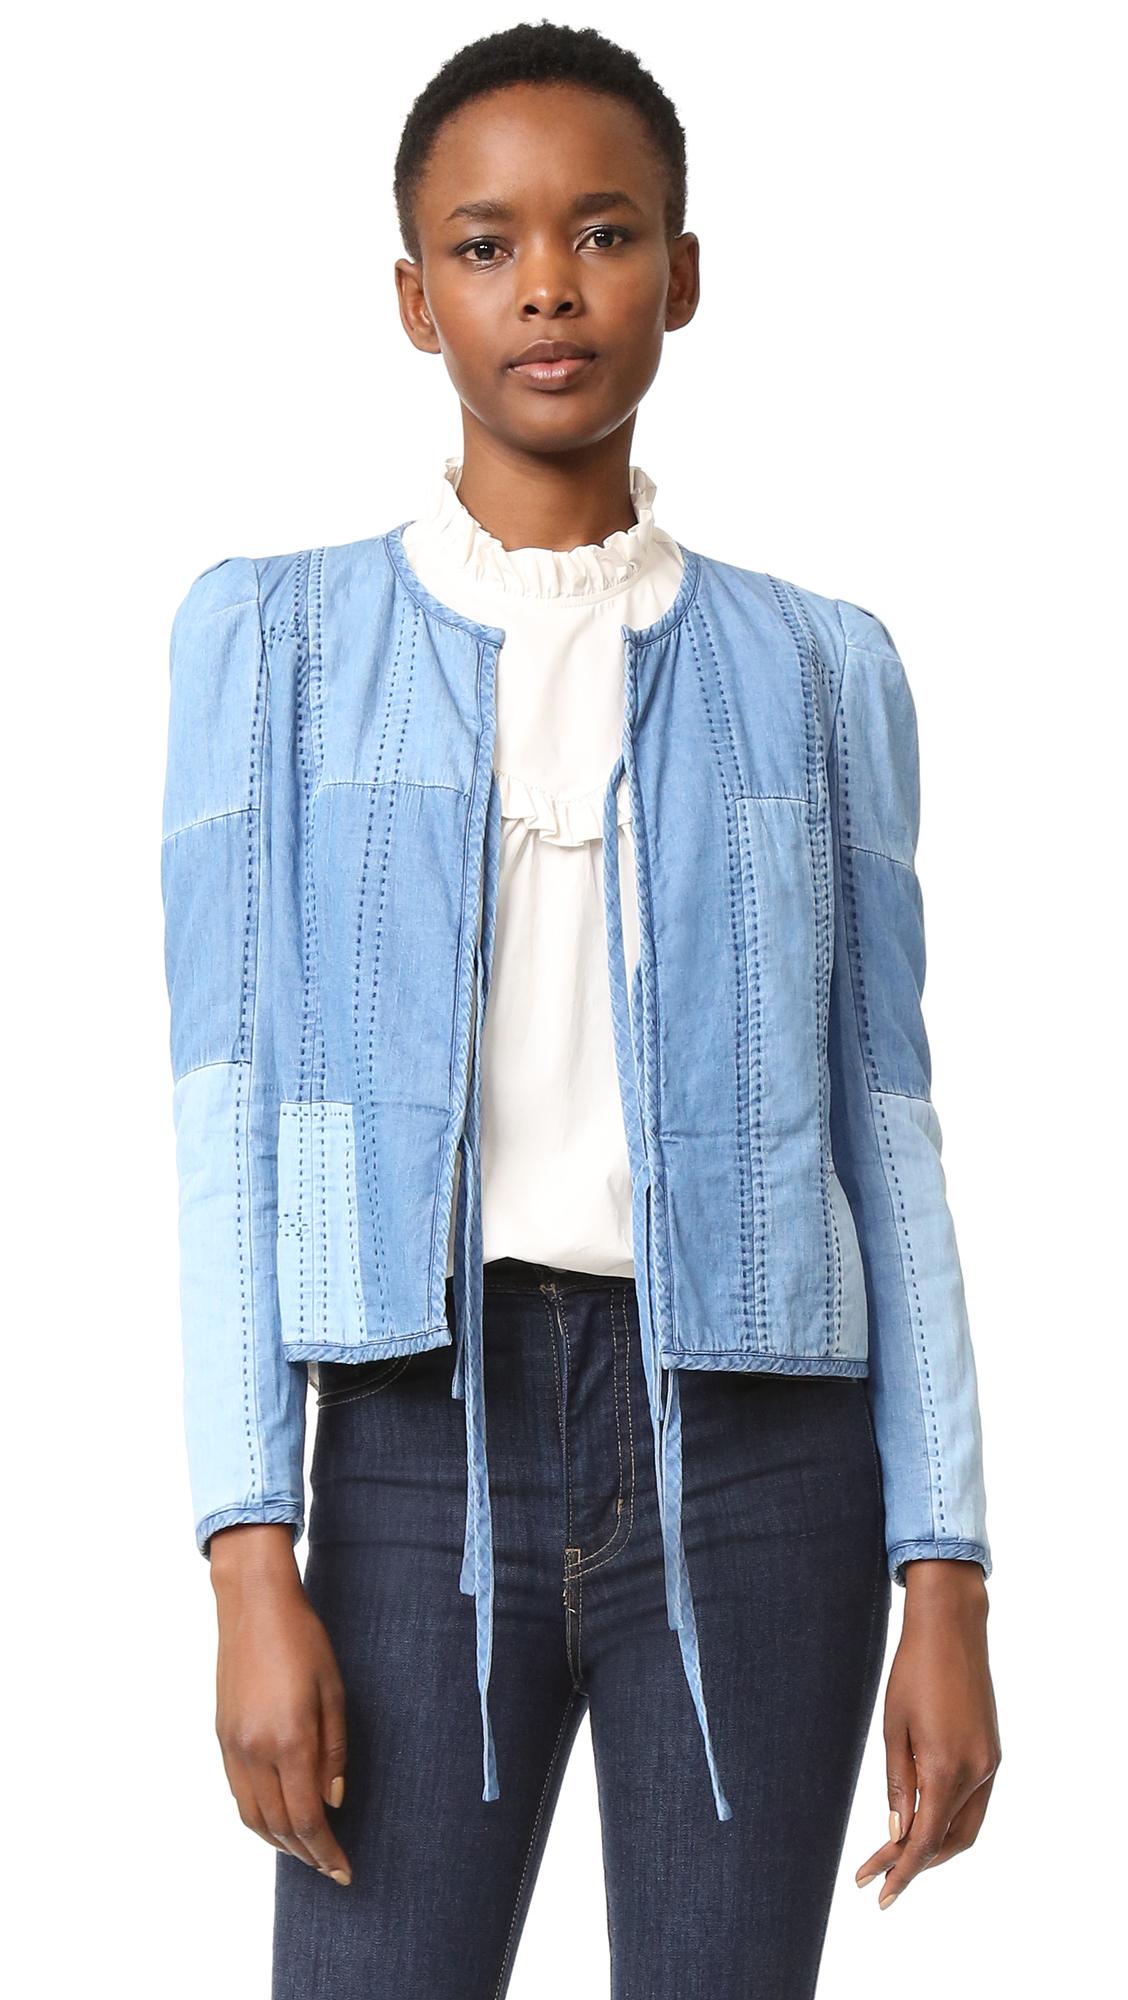 La Vie Rebecca Taylor Indigo Chambray Patchwork Jacket - Indigo Chambray Patch at Shopbop